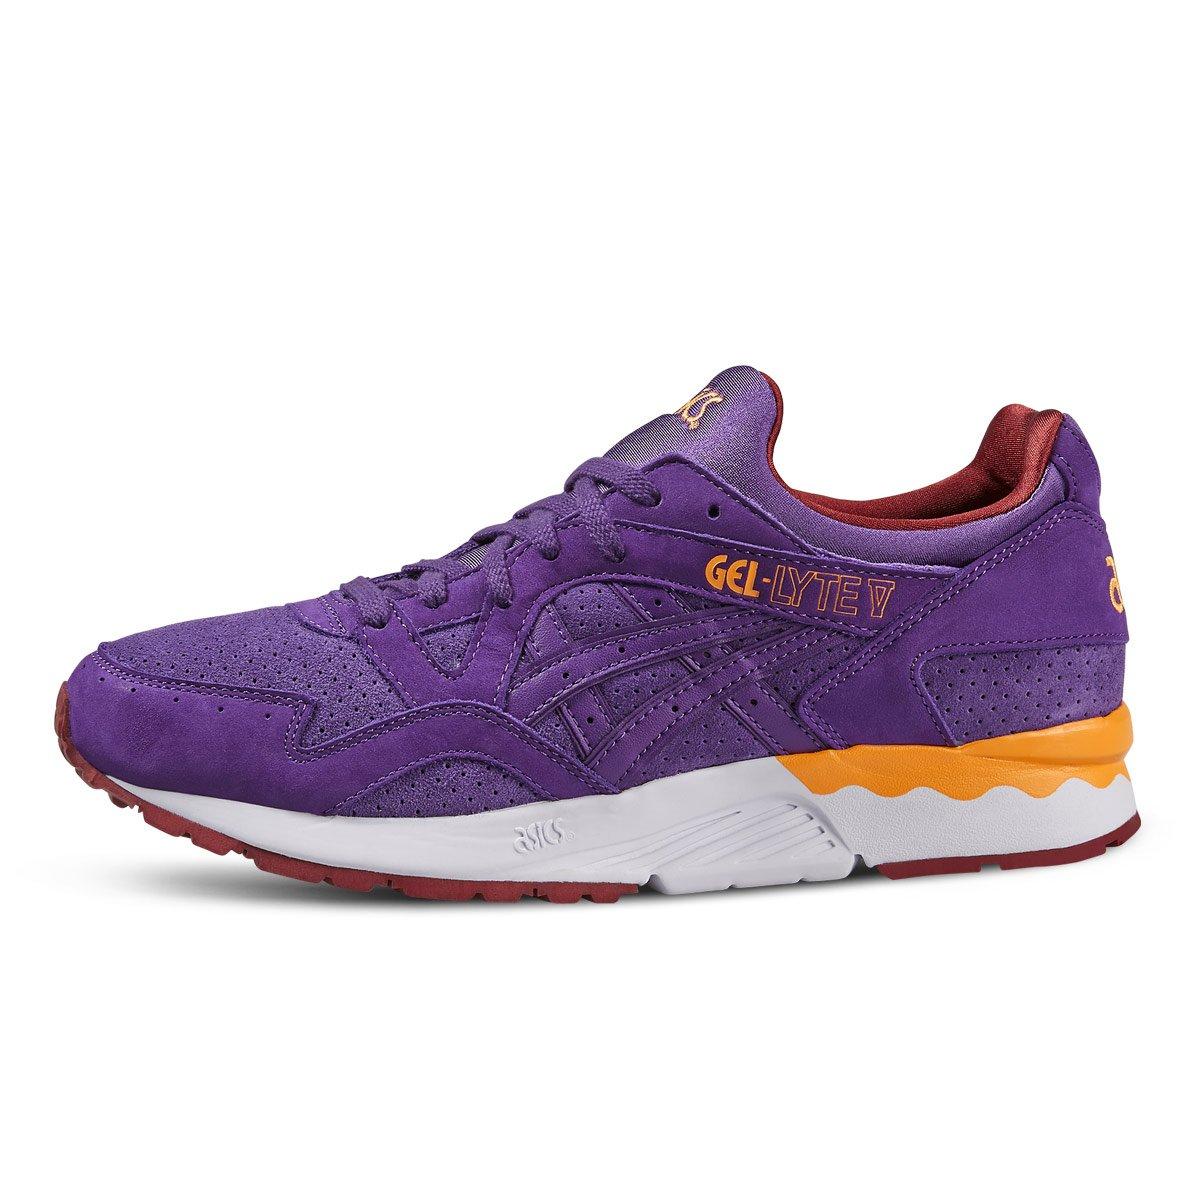 948b4a771fde ASICS Unisex Adults  H5u4y 0113 Tiger Gel-Lyte V White Light Grey Purple  Size  8.5 UK  Amazon.co.uk  Shoes   Bags